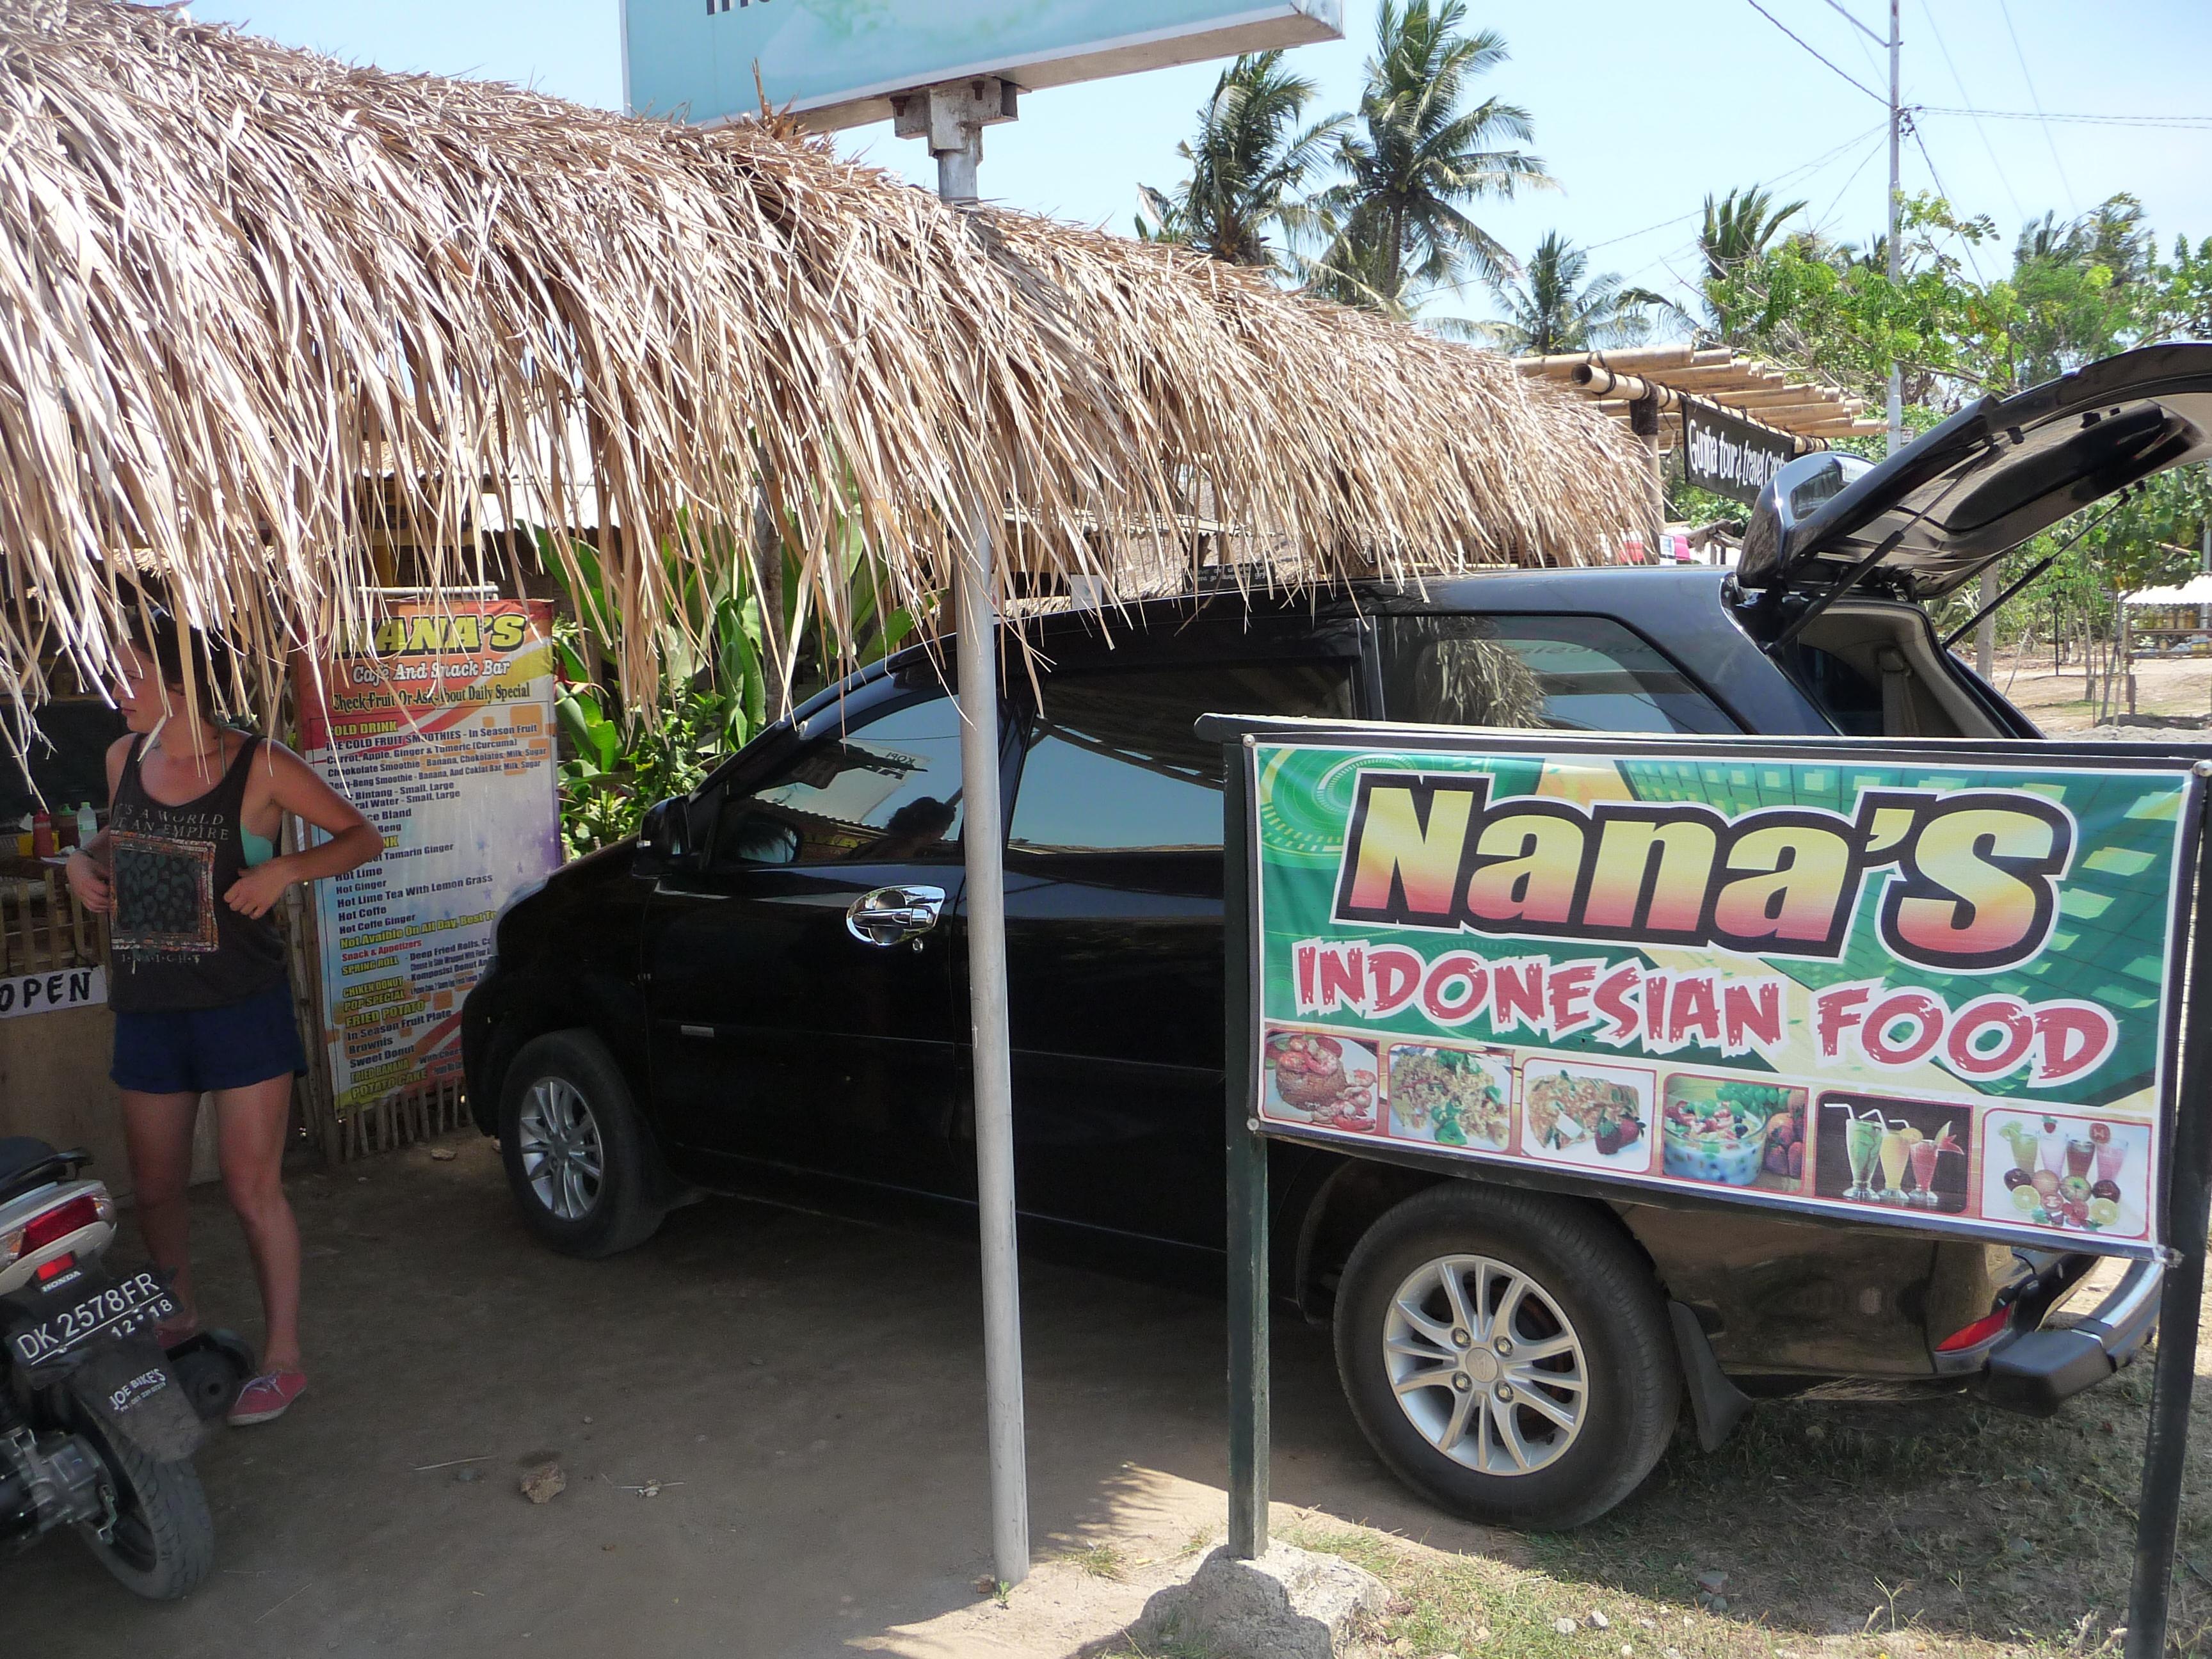 Foody Friday: Nana's Kitchen (Kuta Beach, Lombok)